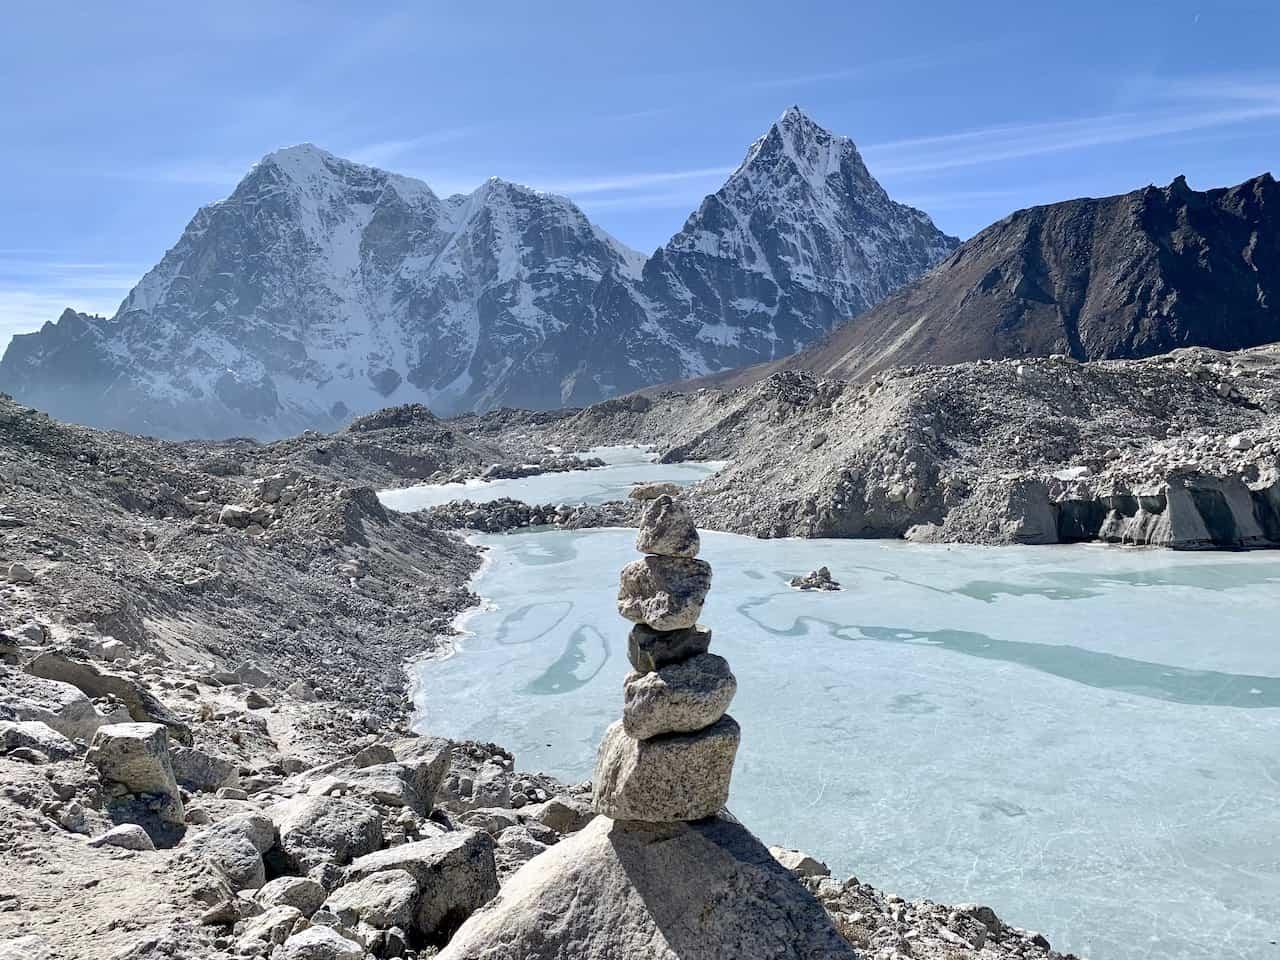 Khumbu Glacier Hike to Lobuche